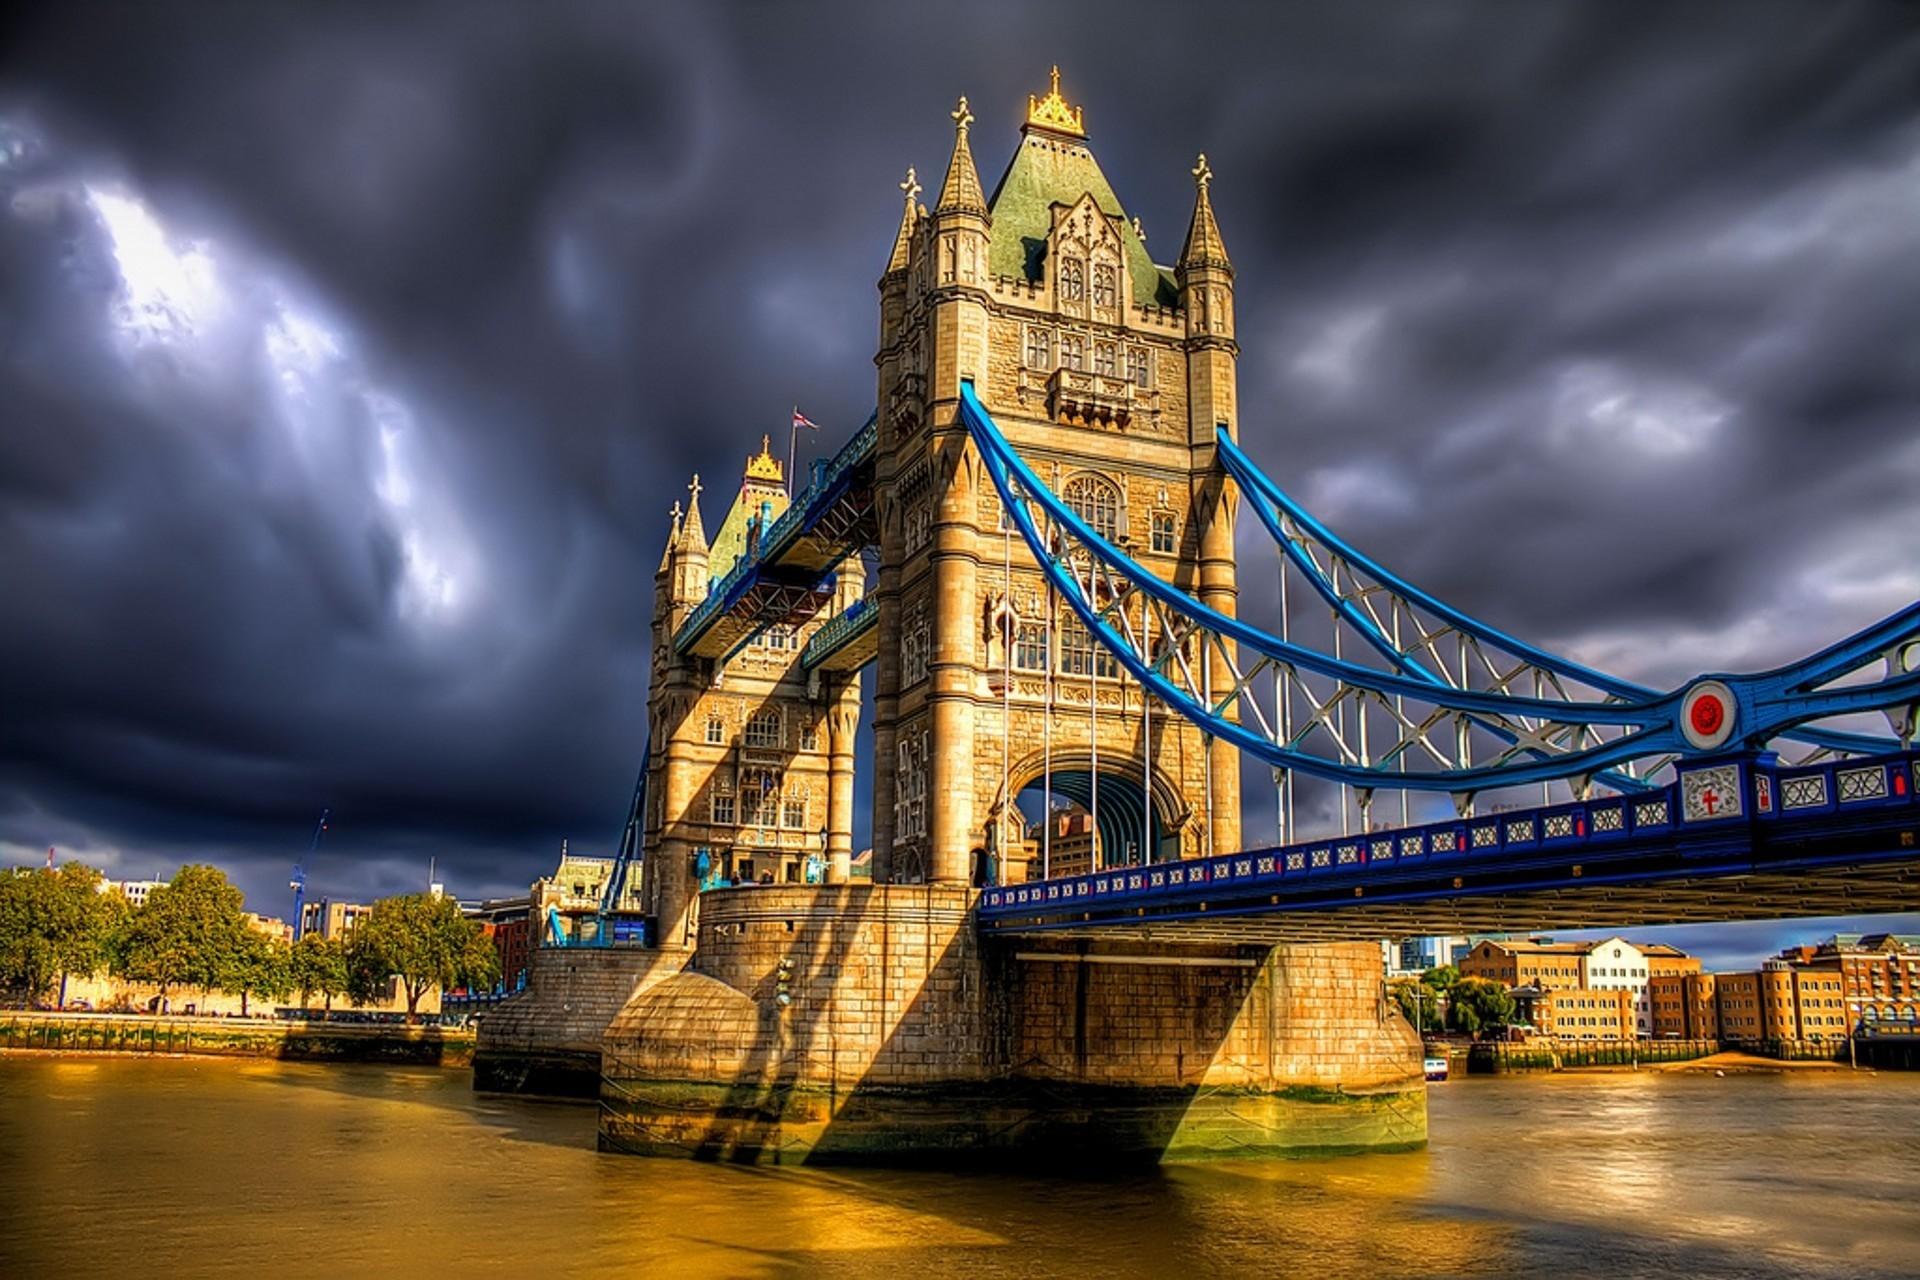 Res: 1920x1280, Tower Bridge Wallpapers 14 - 1920 X 1280